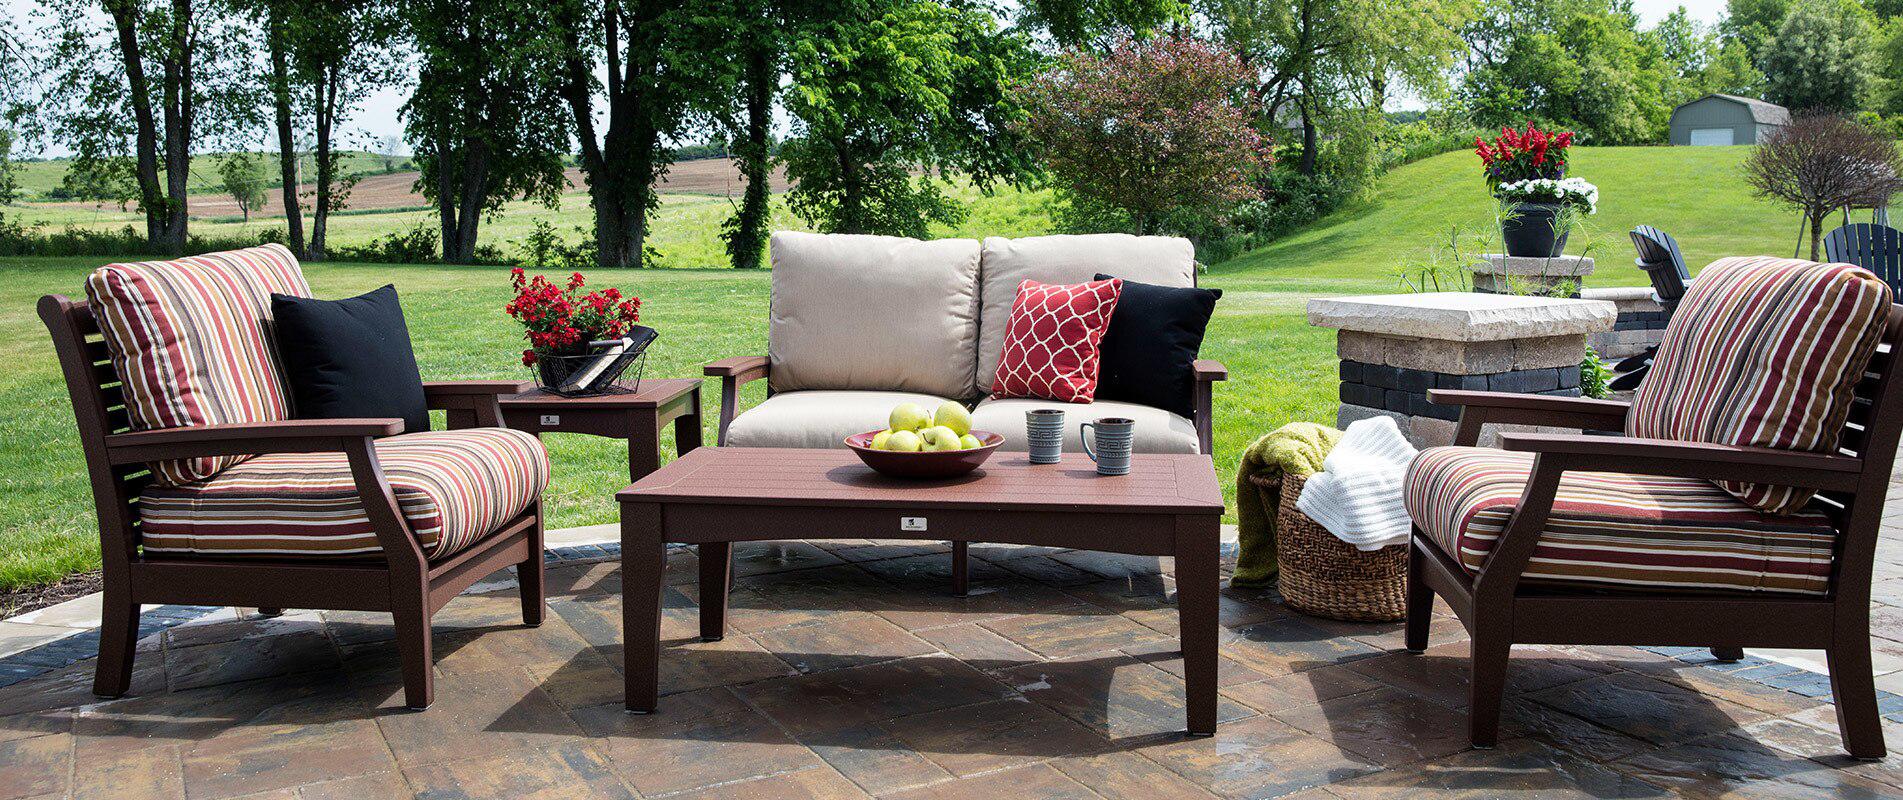 Outdoor Furniture Backyard Sheds Kauffman Lawn Furniture